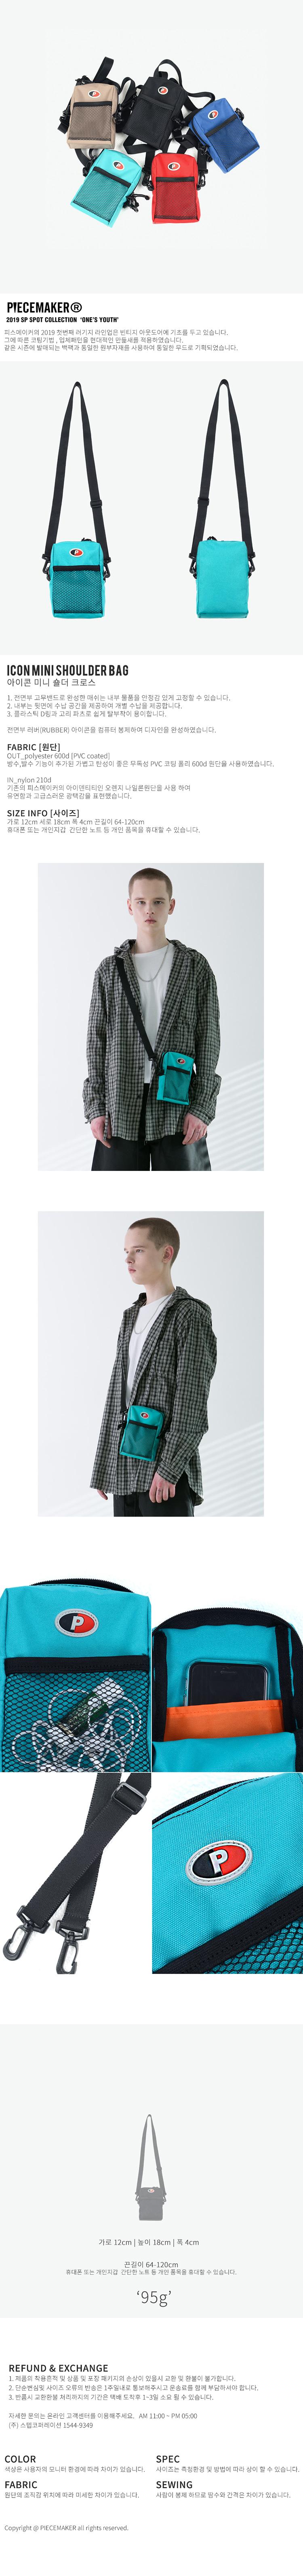 ICON MINI SHOULDER BAG (GREEN)18,800원-피스메이커패션잡화, 가방, 크로스백, 패브릭크로스백바보사랑ICON MINI SHOULDER BAG (GREEN)18,800원-피스메이커패션잡화, 가방, 크로스백, 패브릭크로스백바보사랑